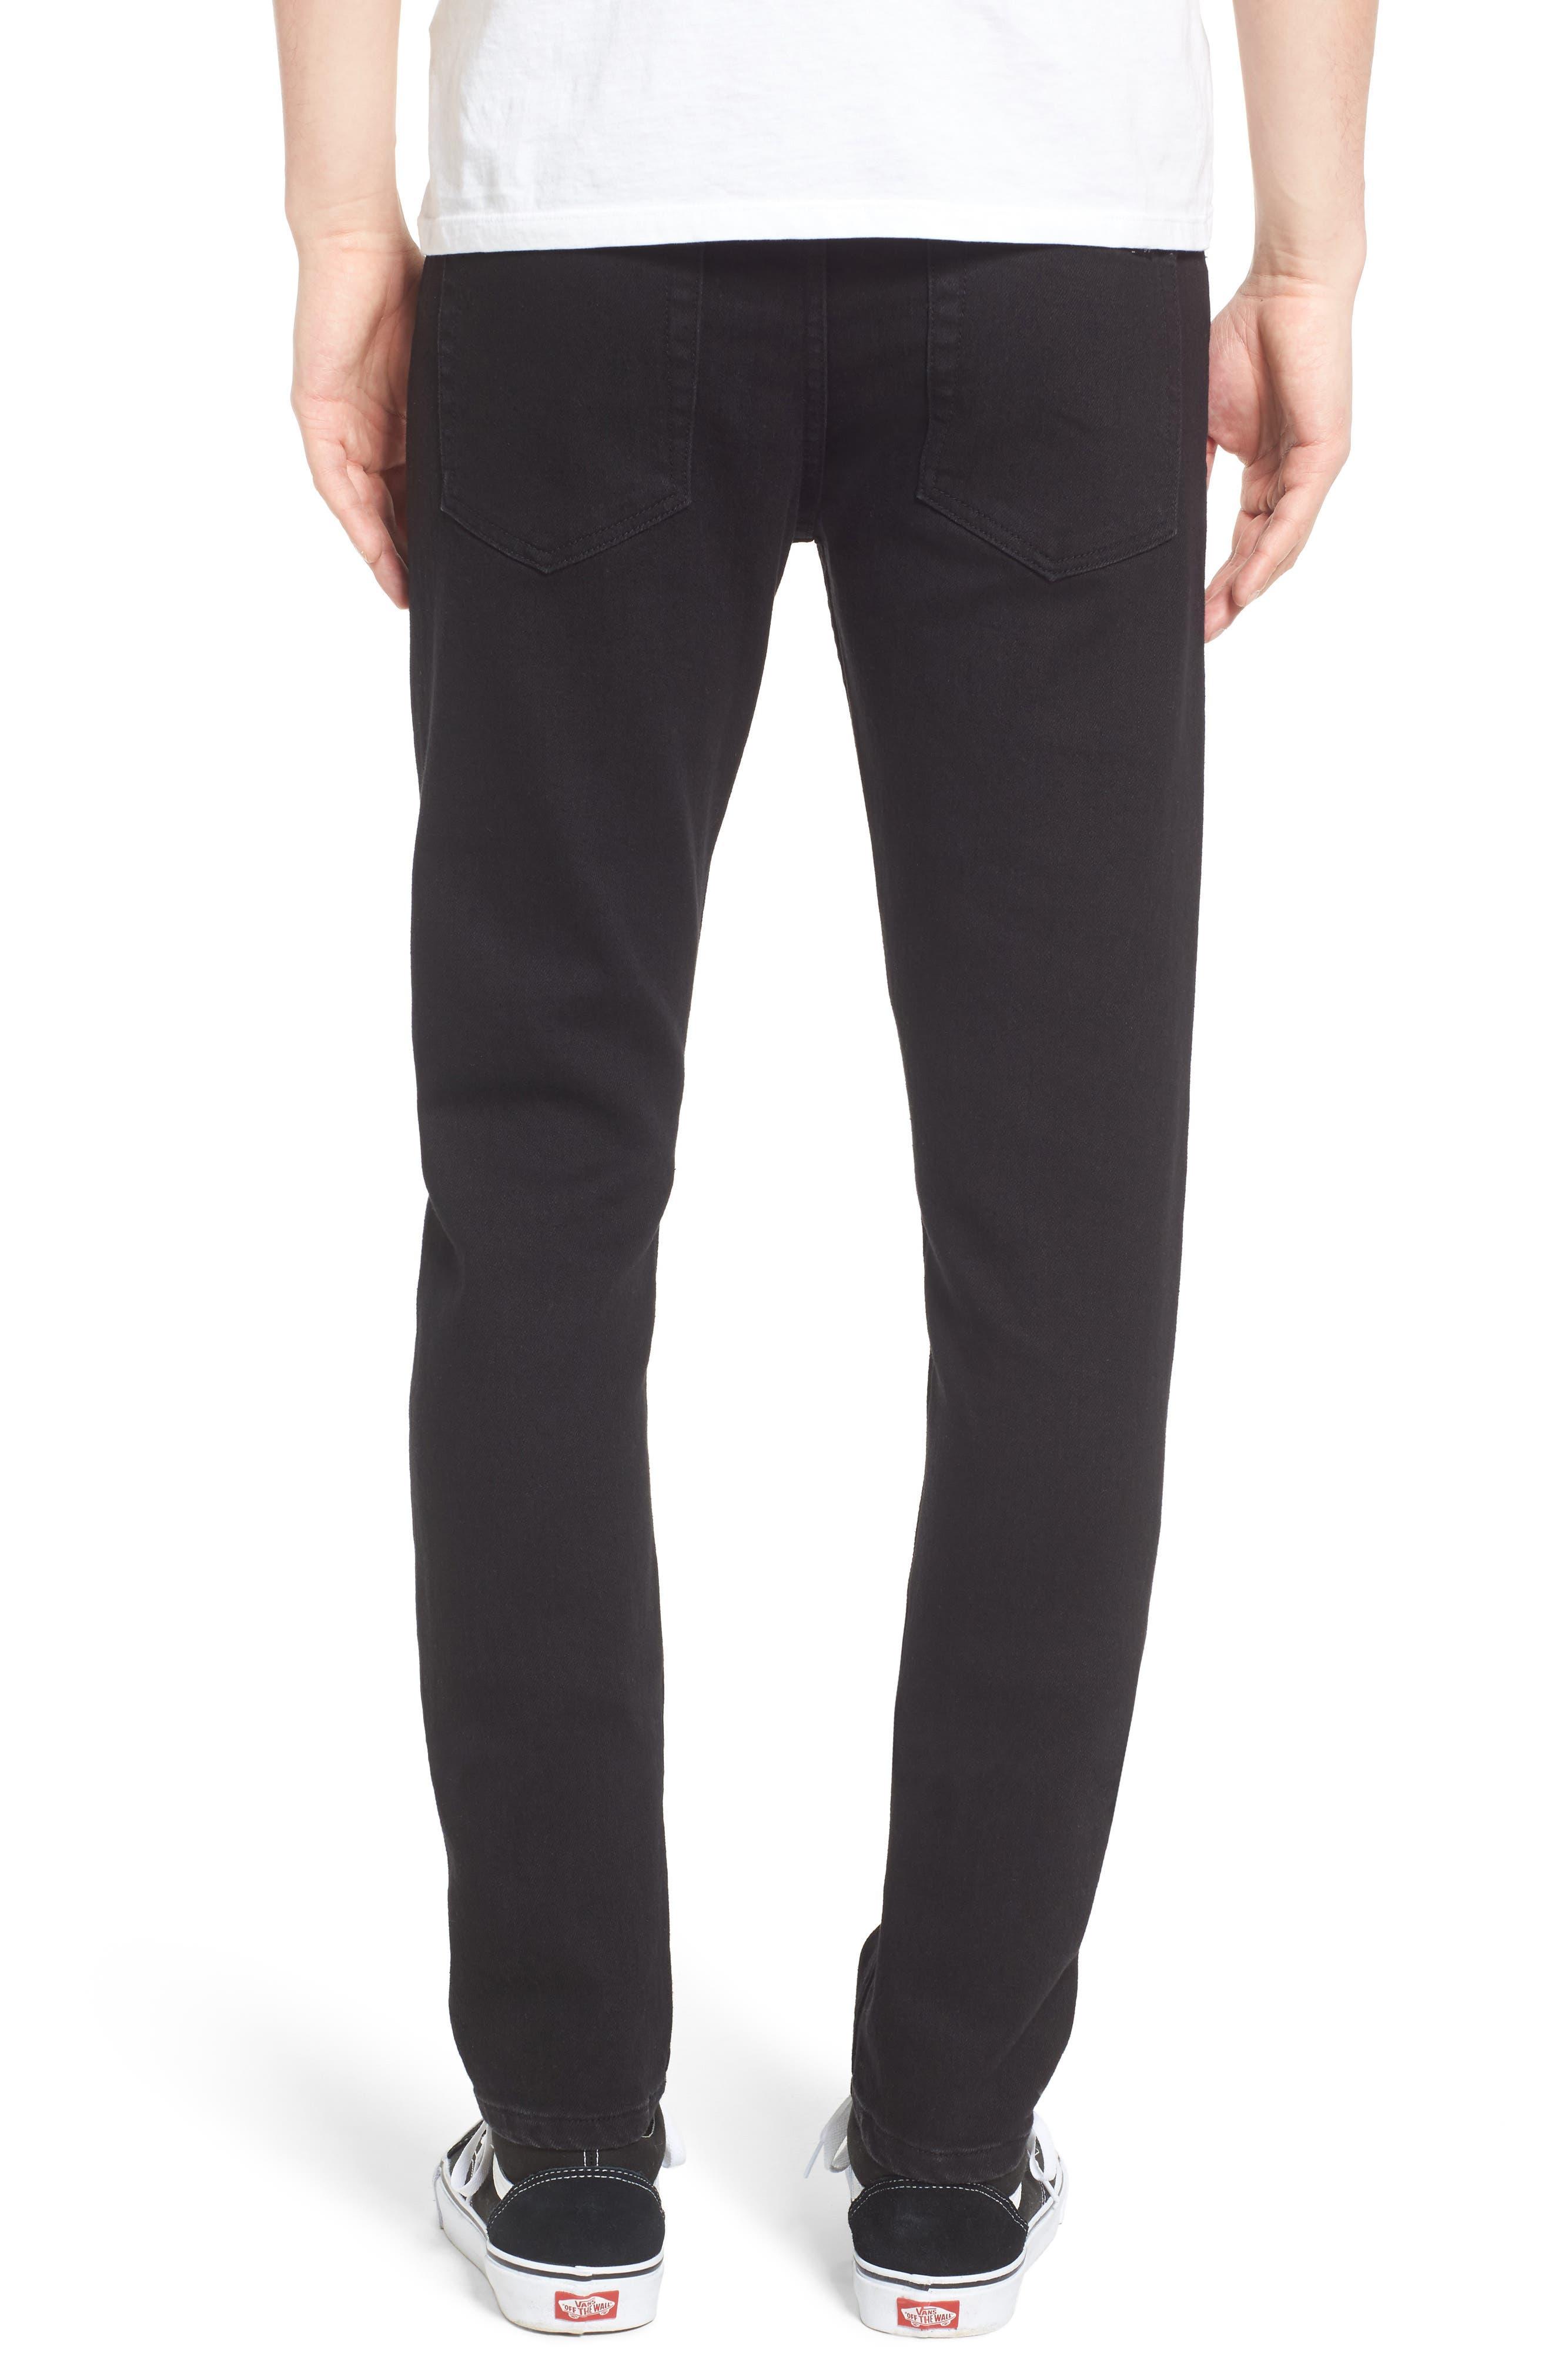 Juvee II Skinny Fit Jeans,                             Alternate thumbnail 2, color,                             Black